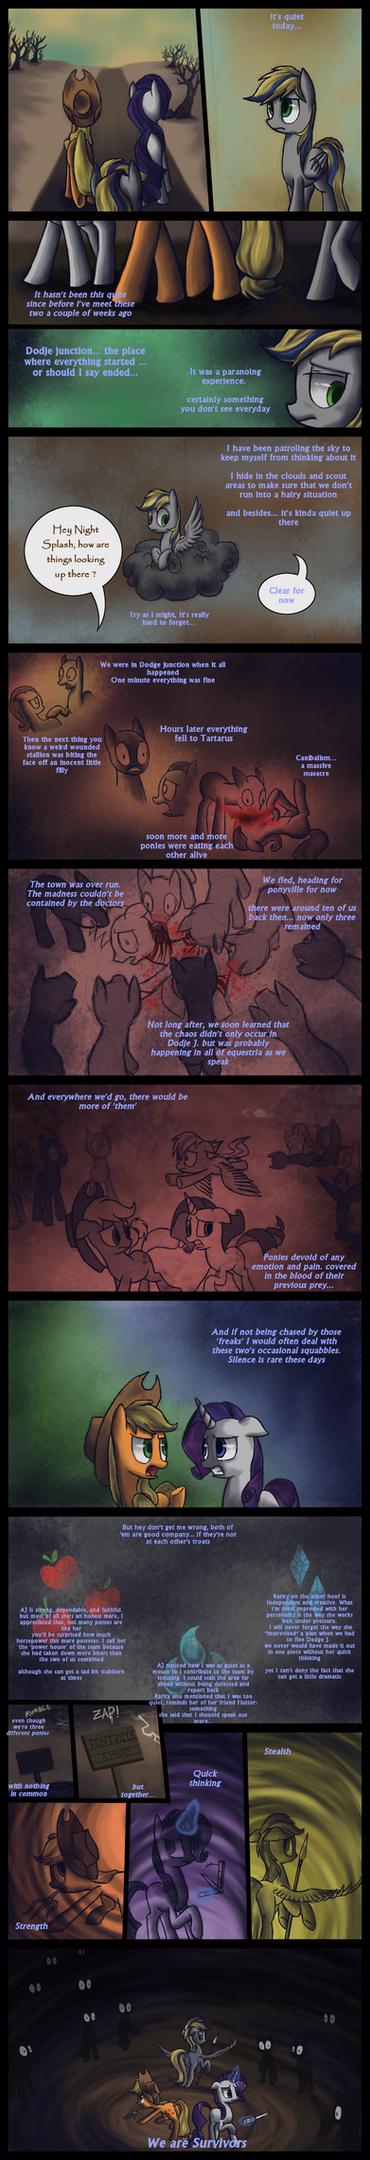 TD9 Survivors by xilenobody143